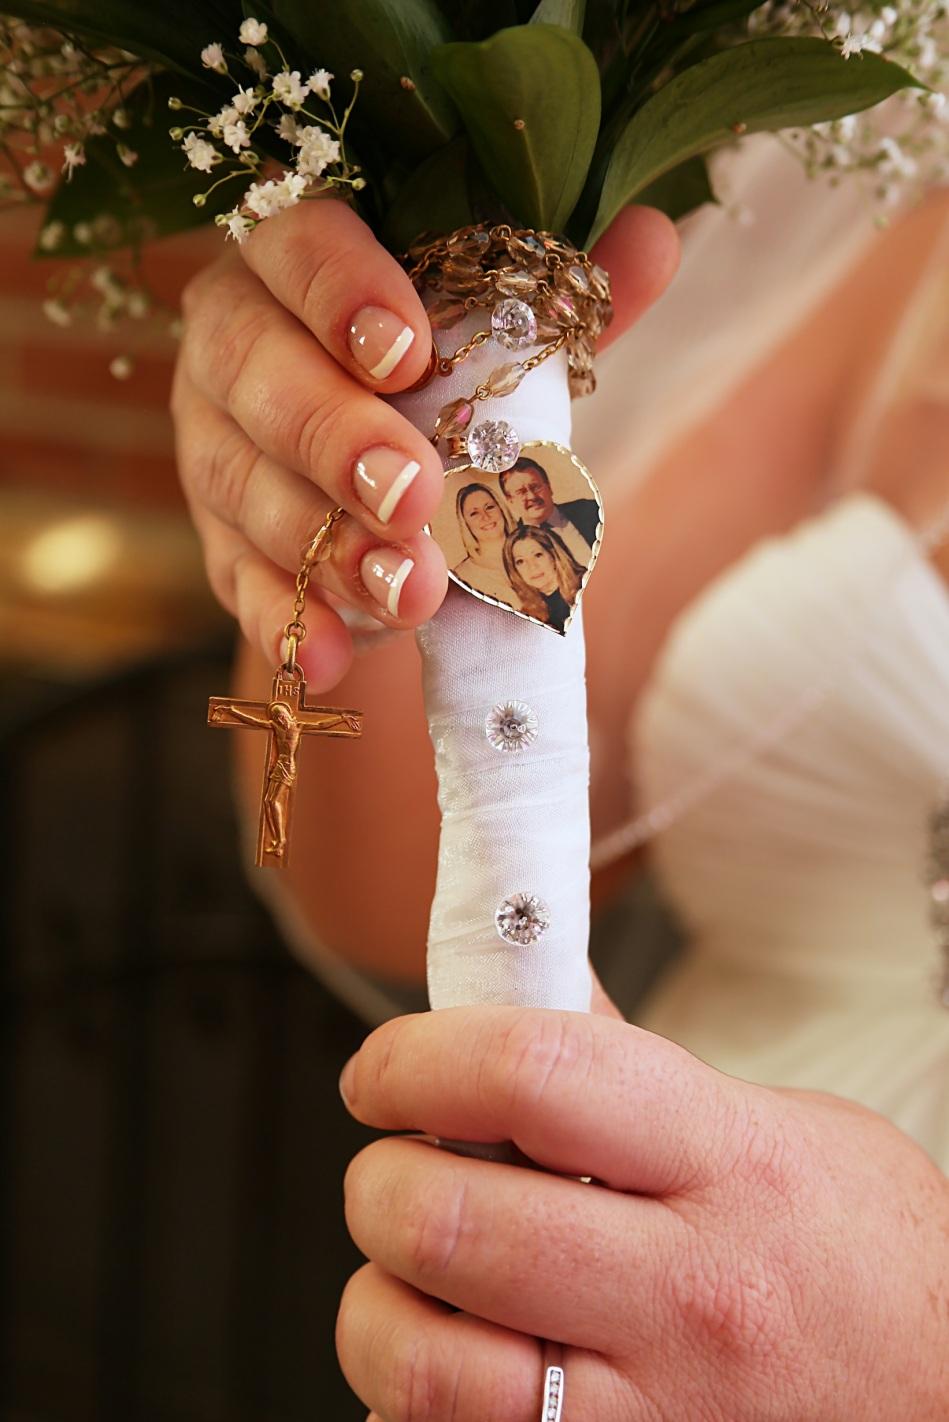 #bridetobe, #njwedding, #apicturesquememoryphotography, #weddings, #pomptonlakesnjwedding, #bridalprep, #weddingphotos, #njweddingphotography